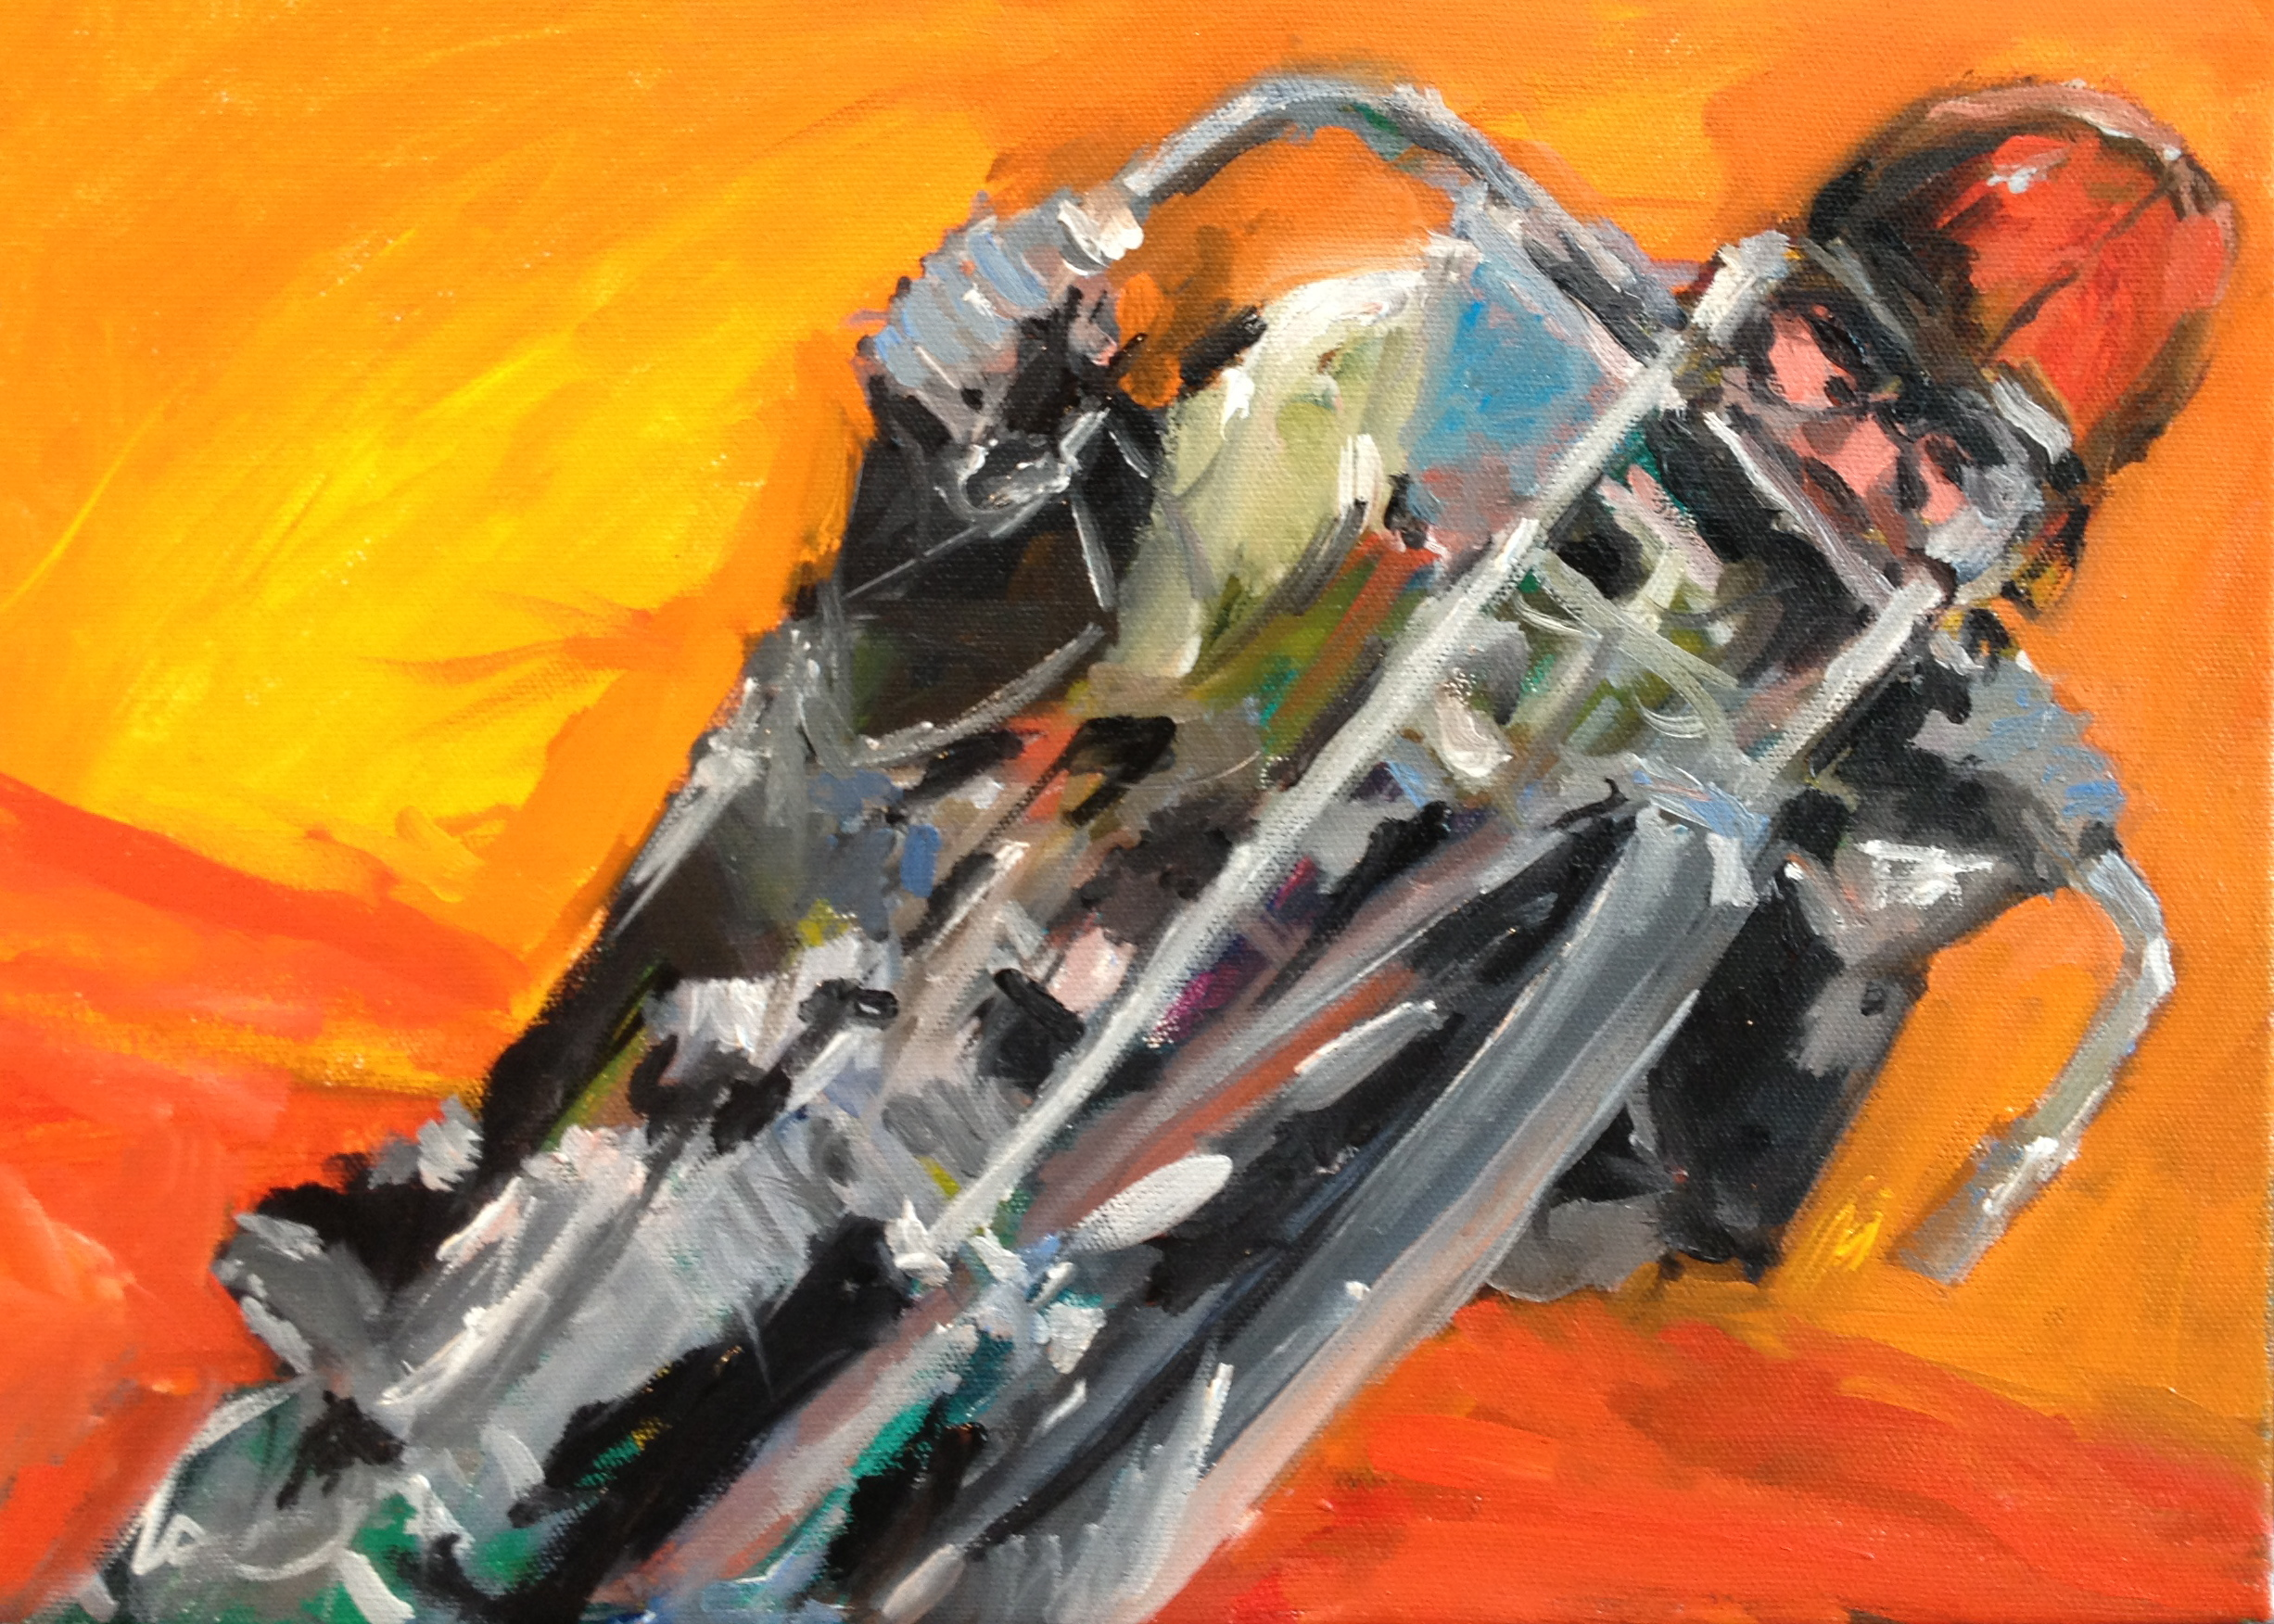 9369-98-TR         TRACK RACER